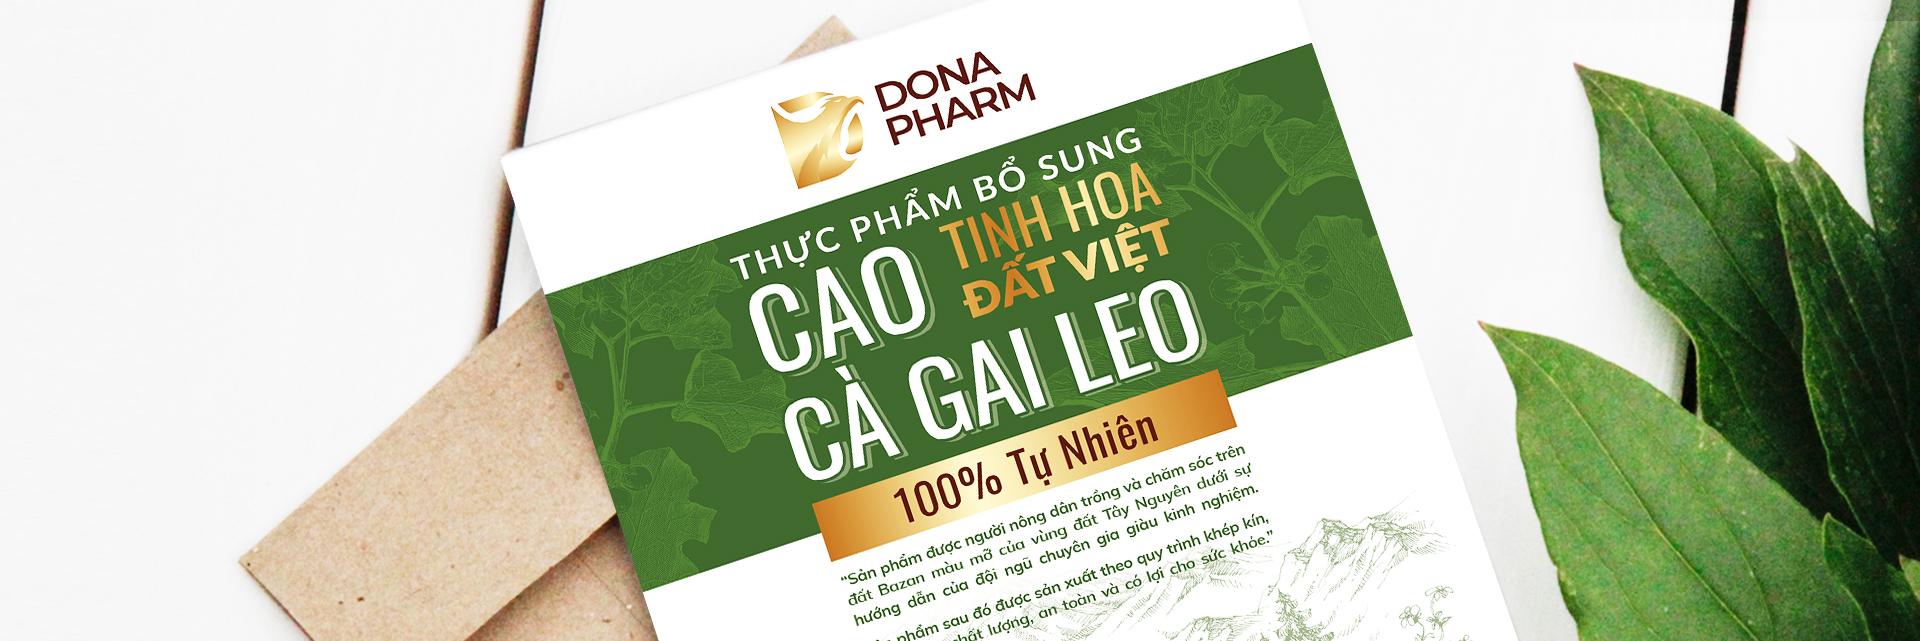 Donapharm_thiet_ke_poster_chuyen_nghiep_gia_tott_Slide-Quang-cao